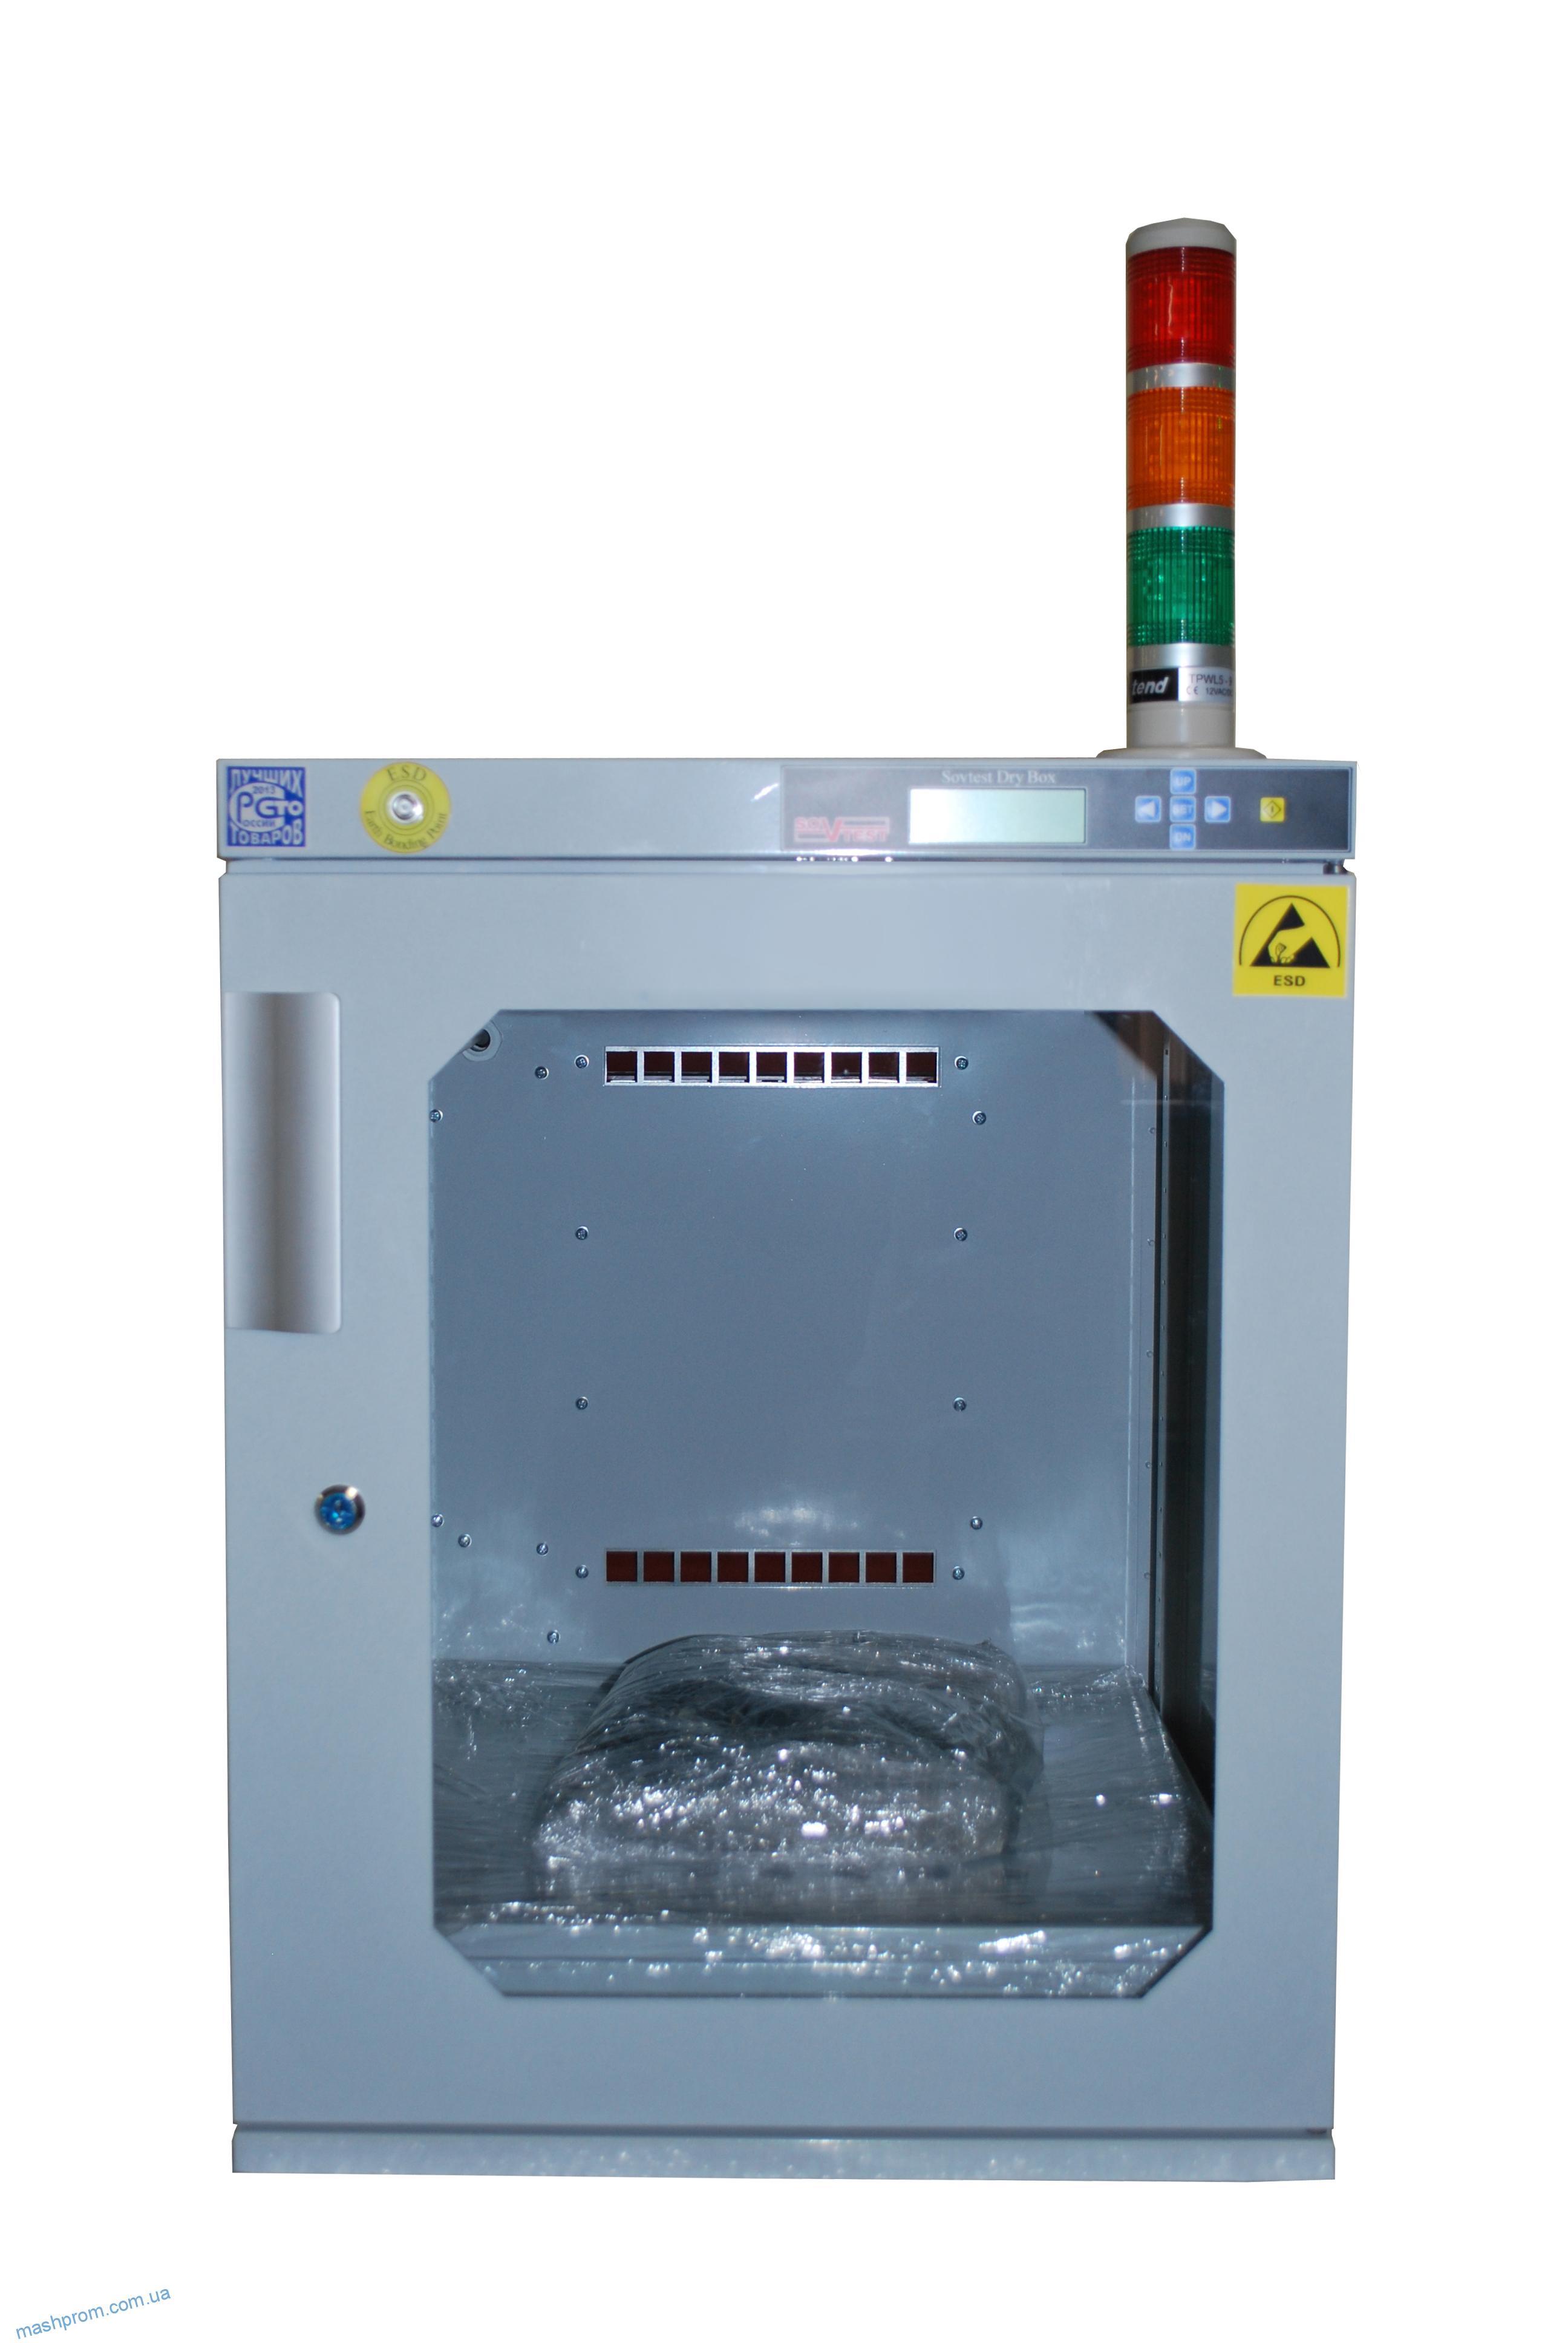 Шкаф сухого хранения SDB151 ДИ с функцией автоматизации